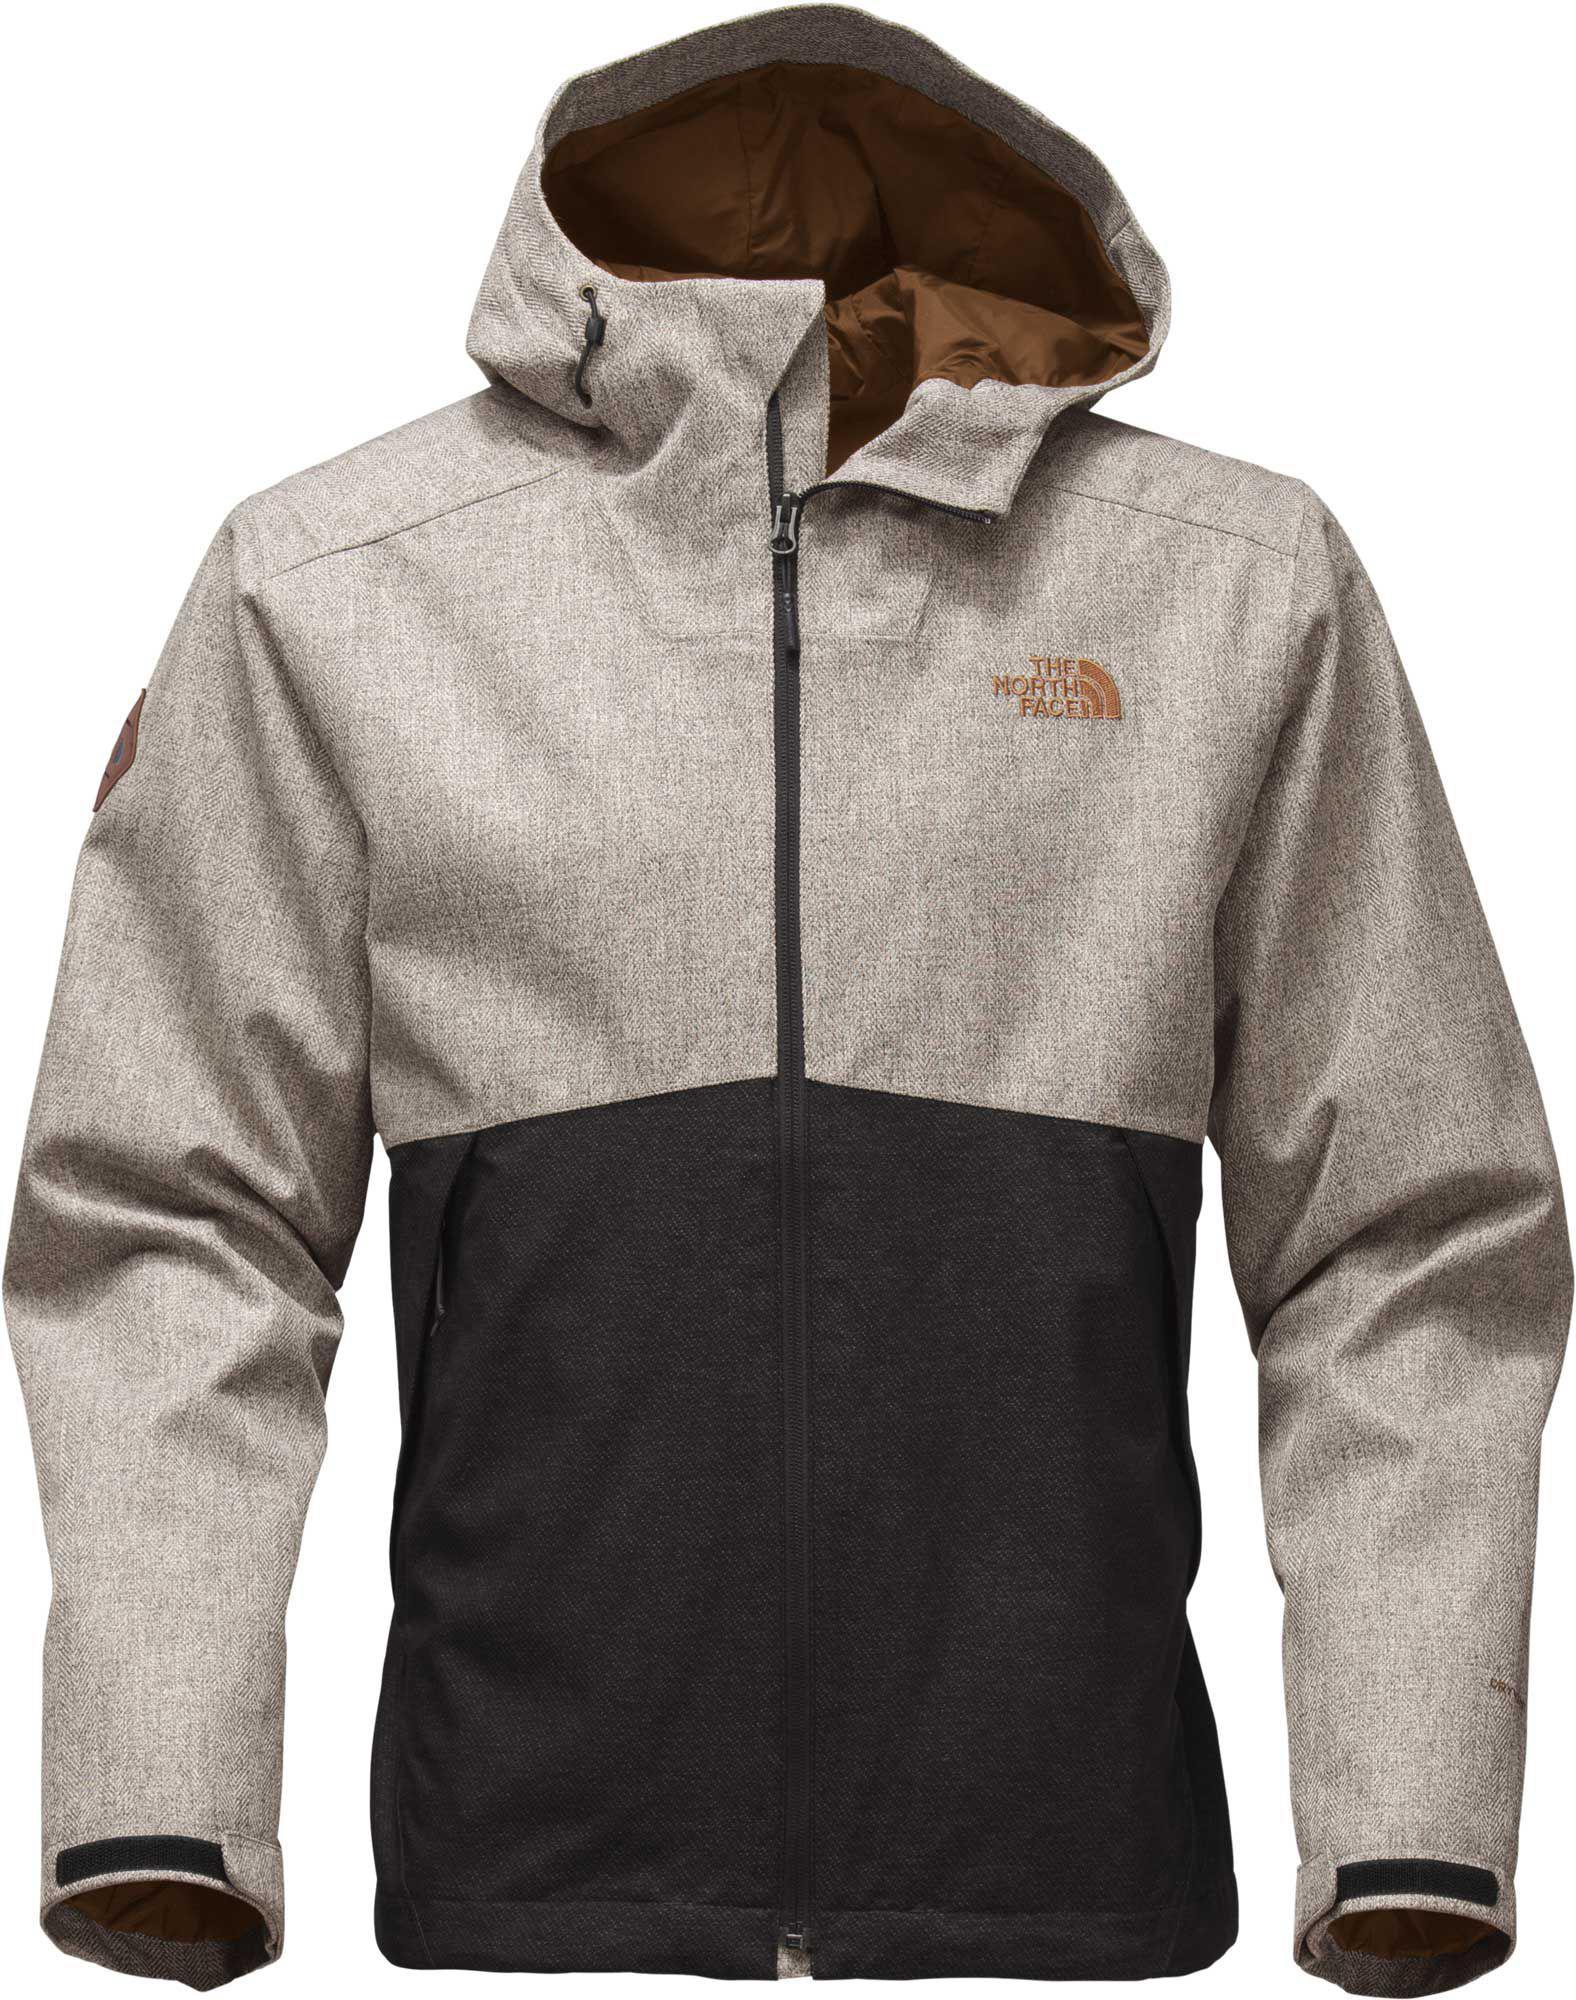 ad23d4639 The North Face Multicolor Millerton Rain Jacket for men